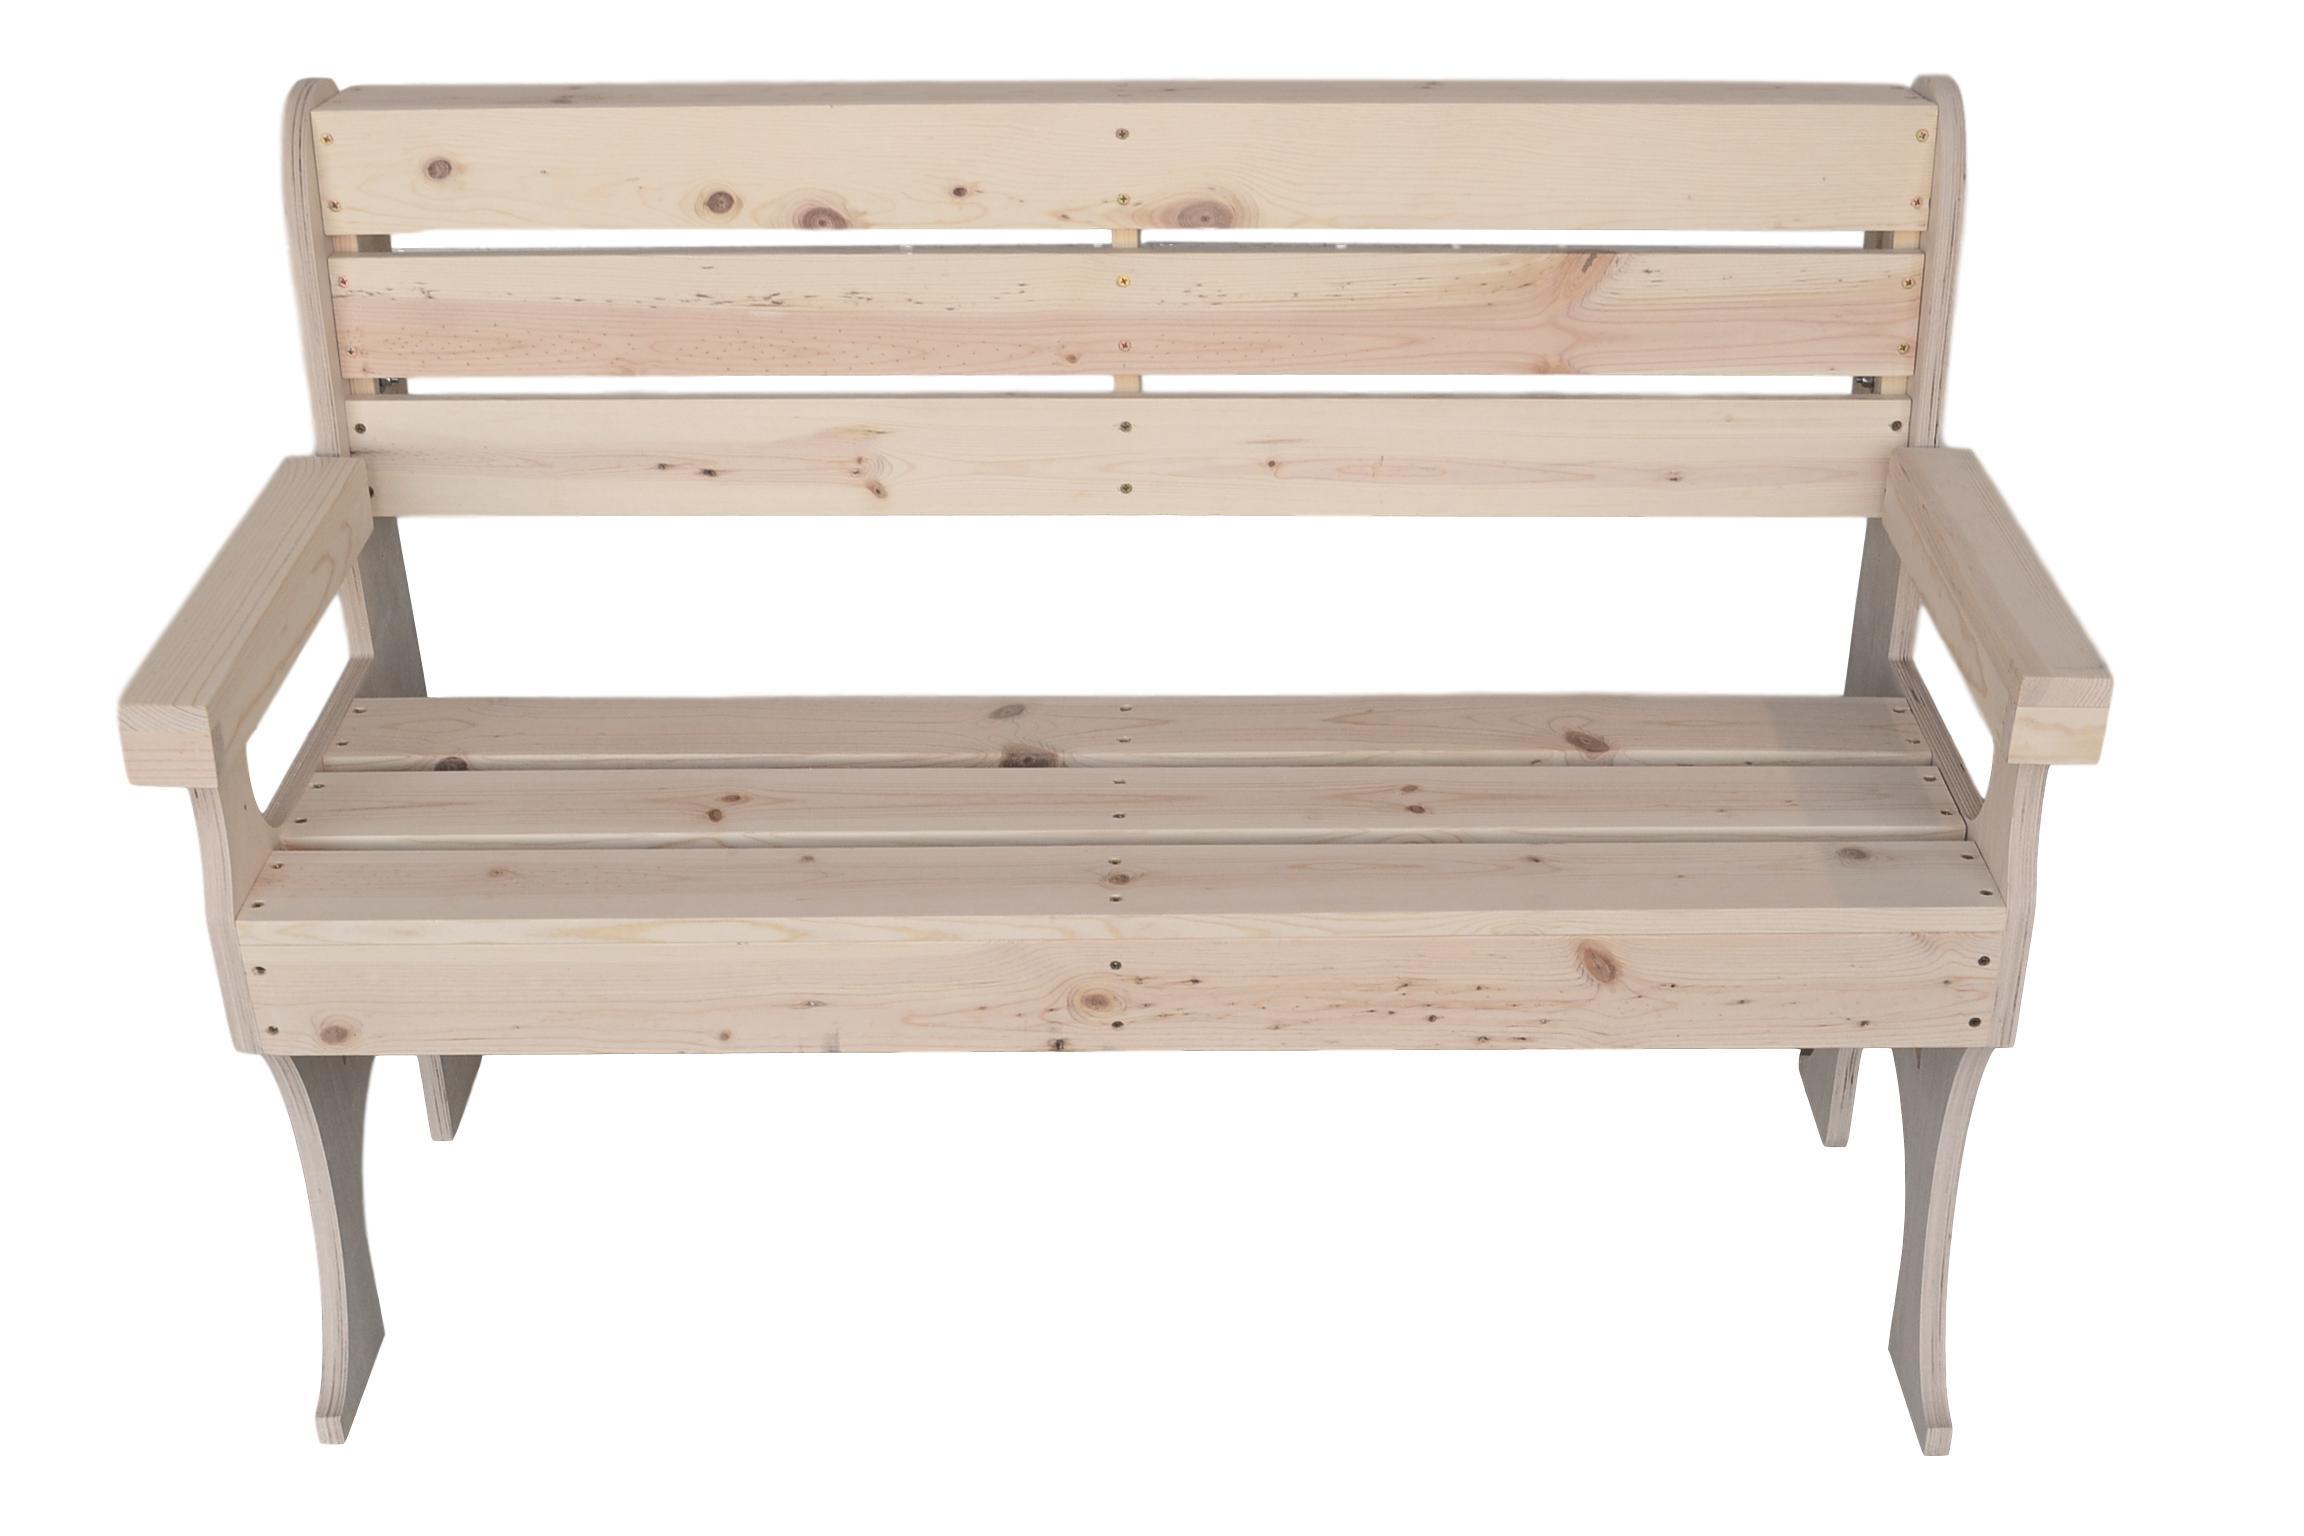 Remarkable Wooden Park Bench 48 Inches Long Lamtechconsult Wood Chair Design Ideas Lamtechconsultcom